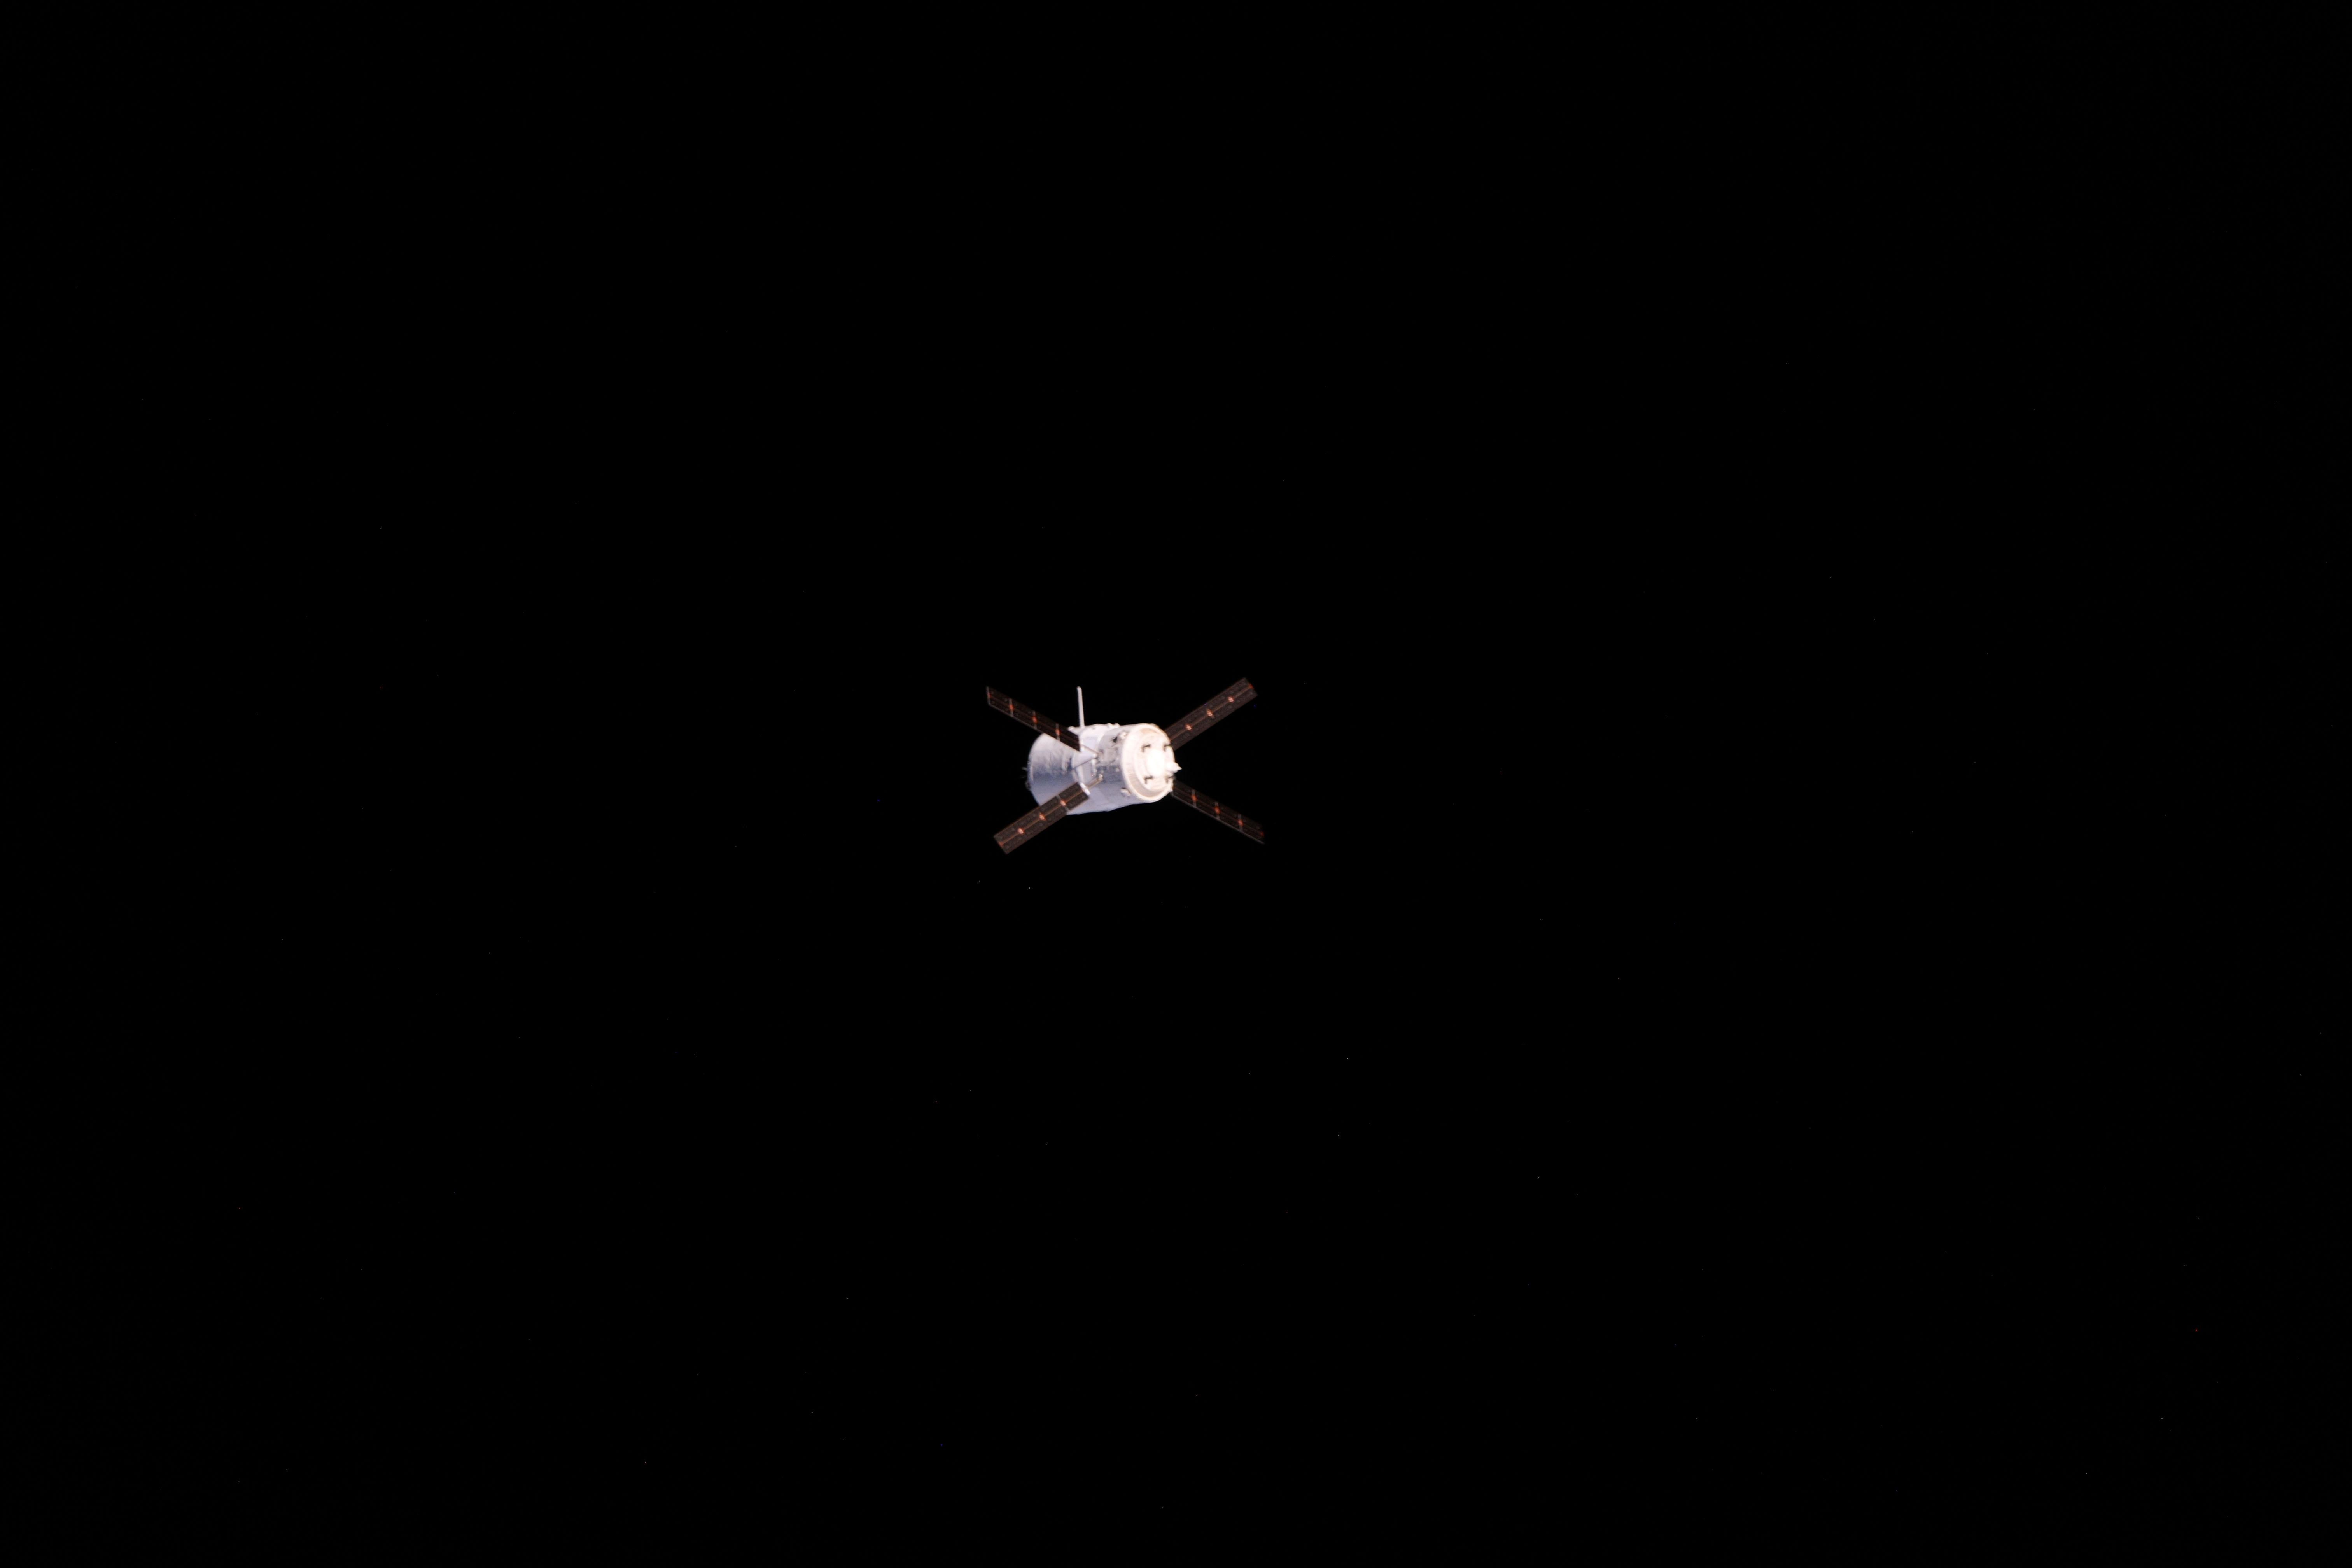 ATV-4 Docks at ISS